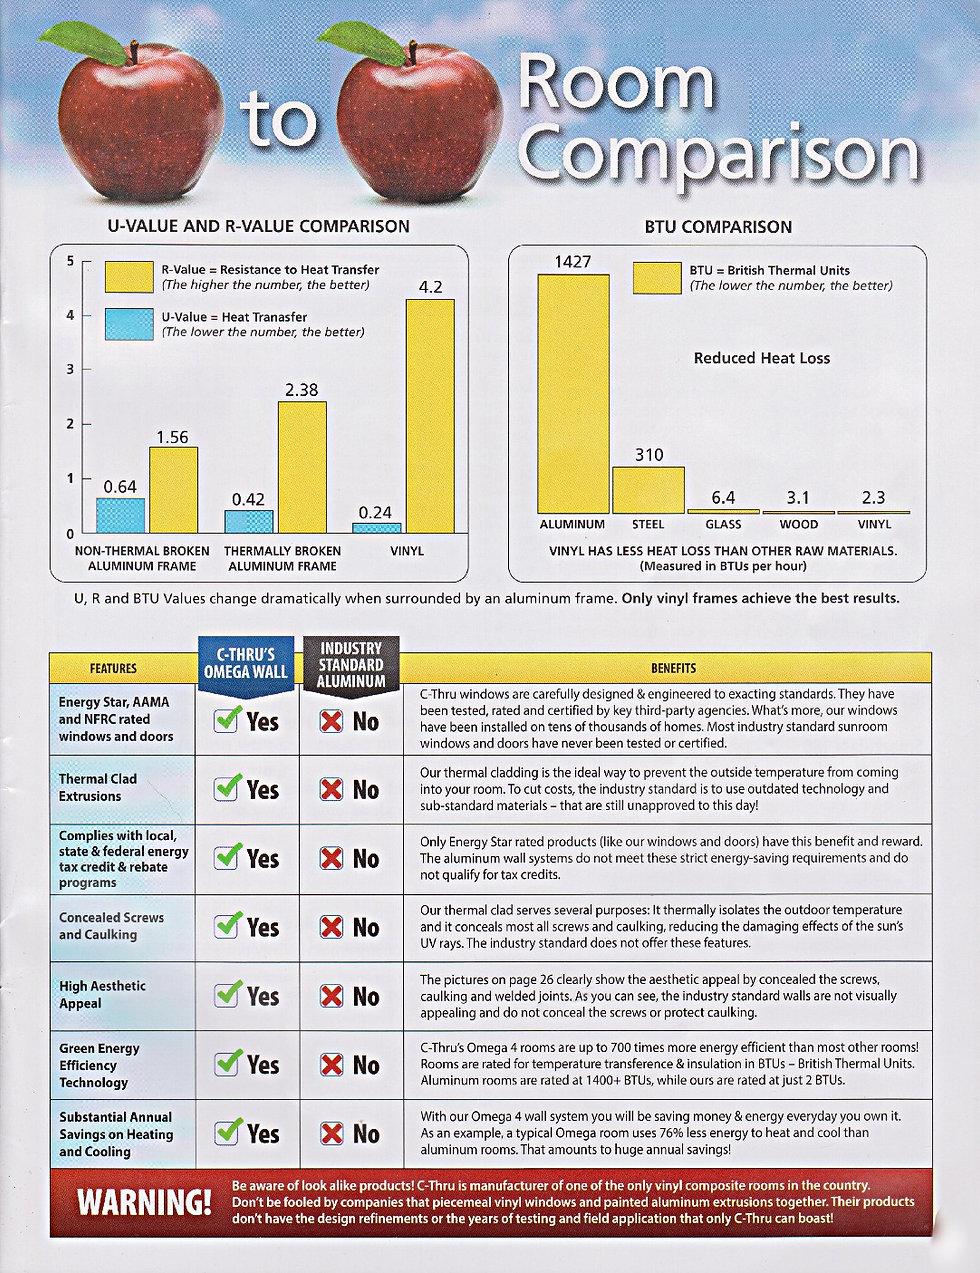 Room R-value, U-value comparison and BTU comparisons